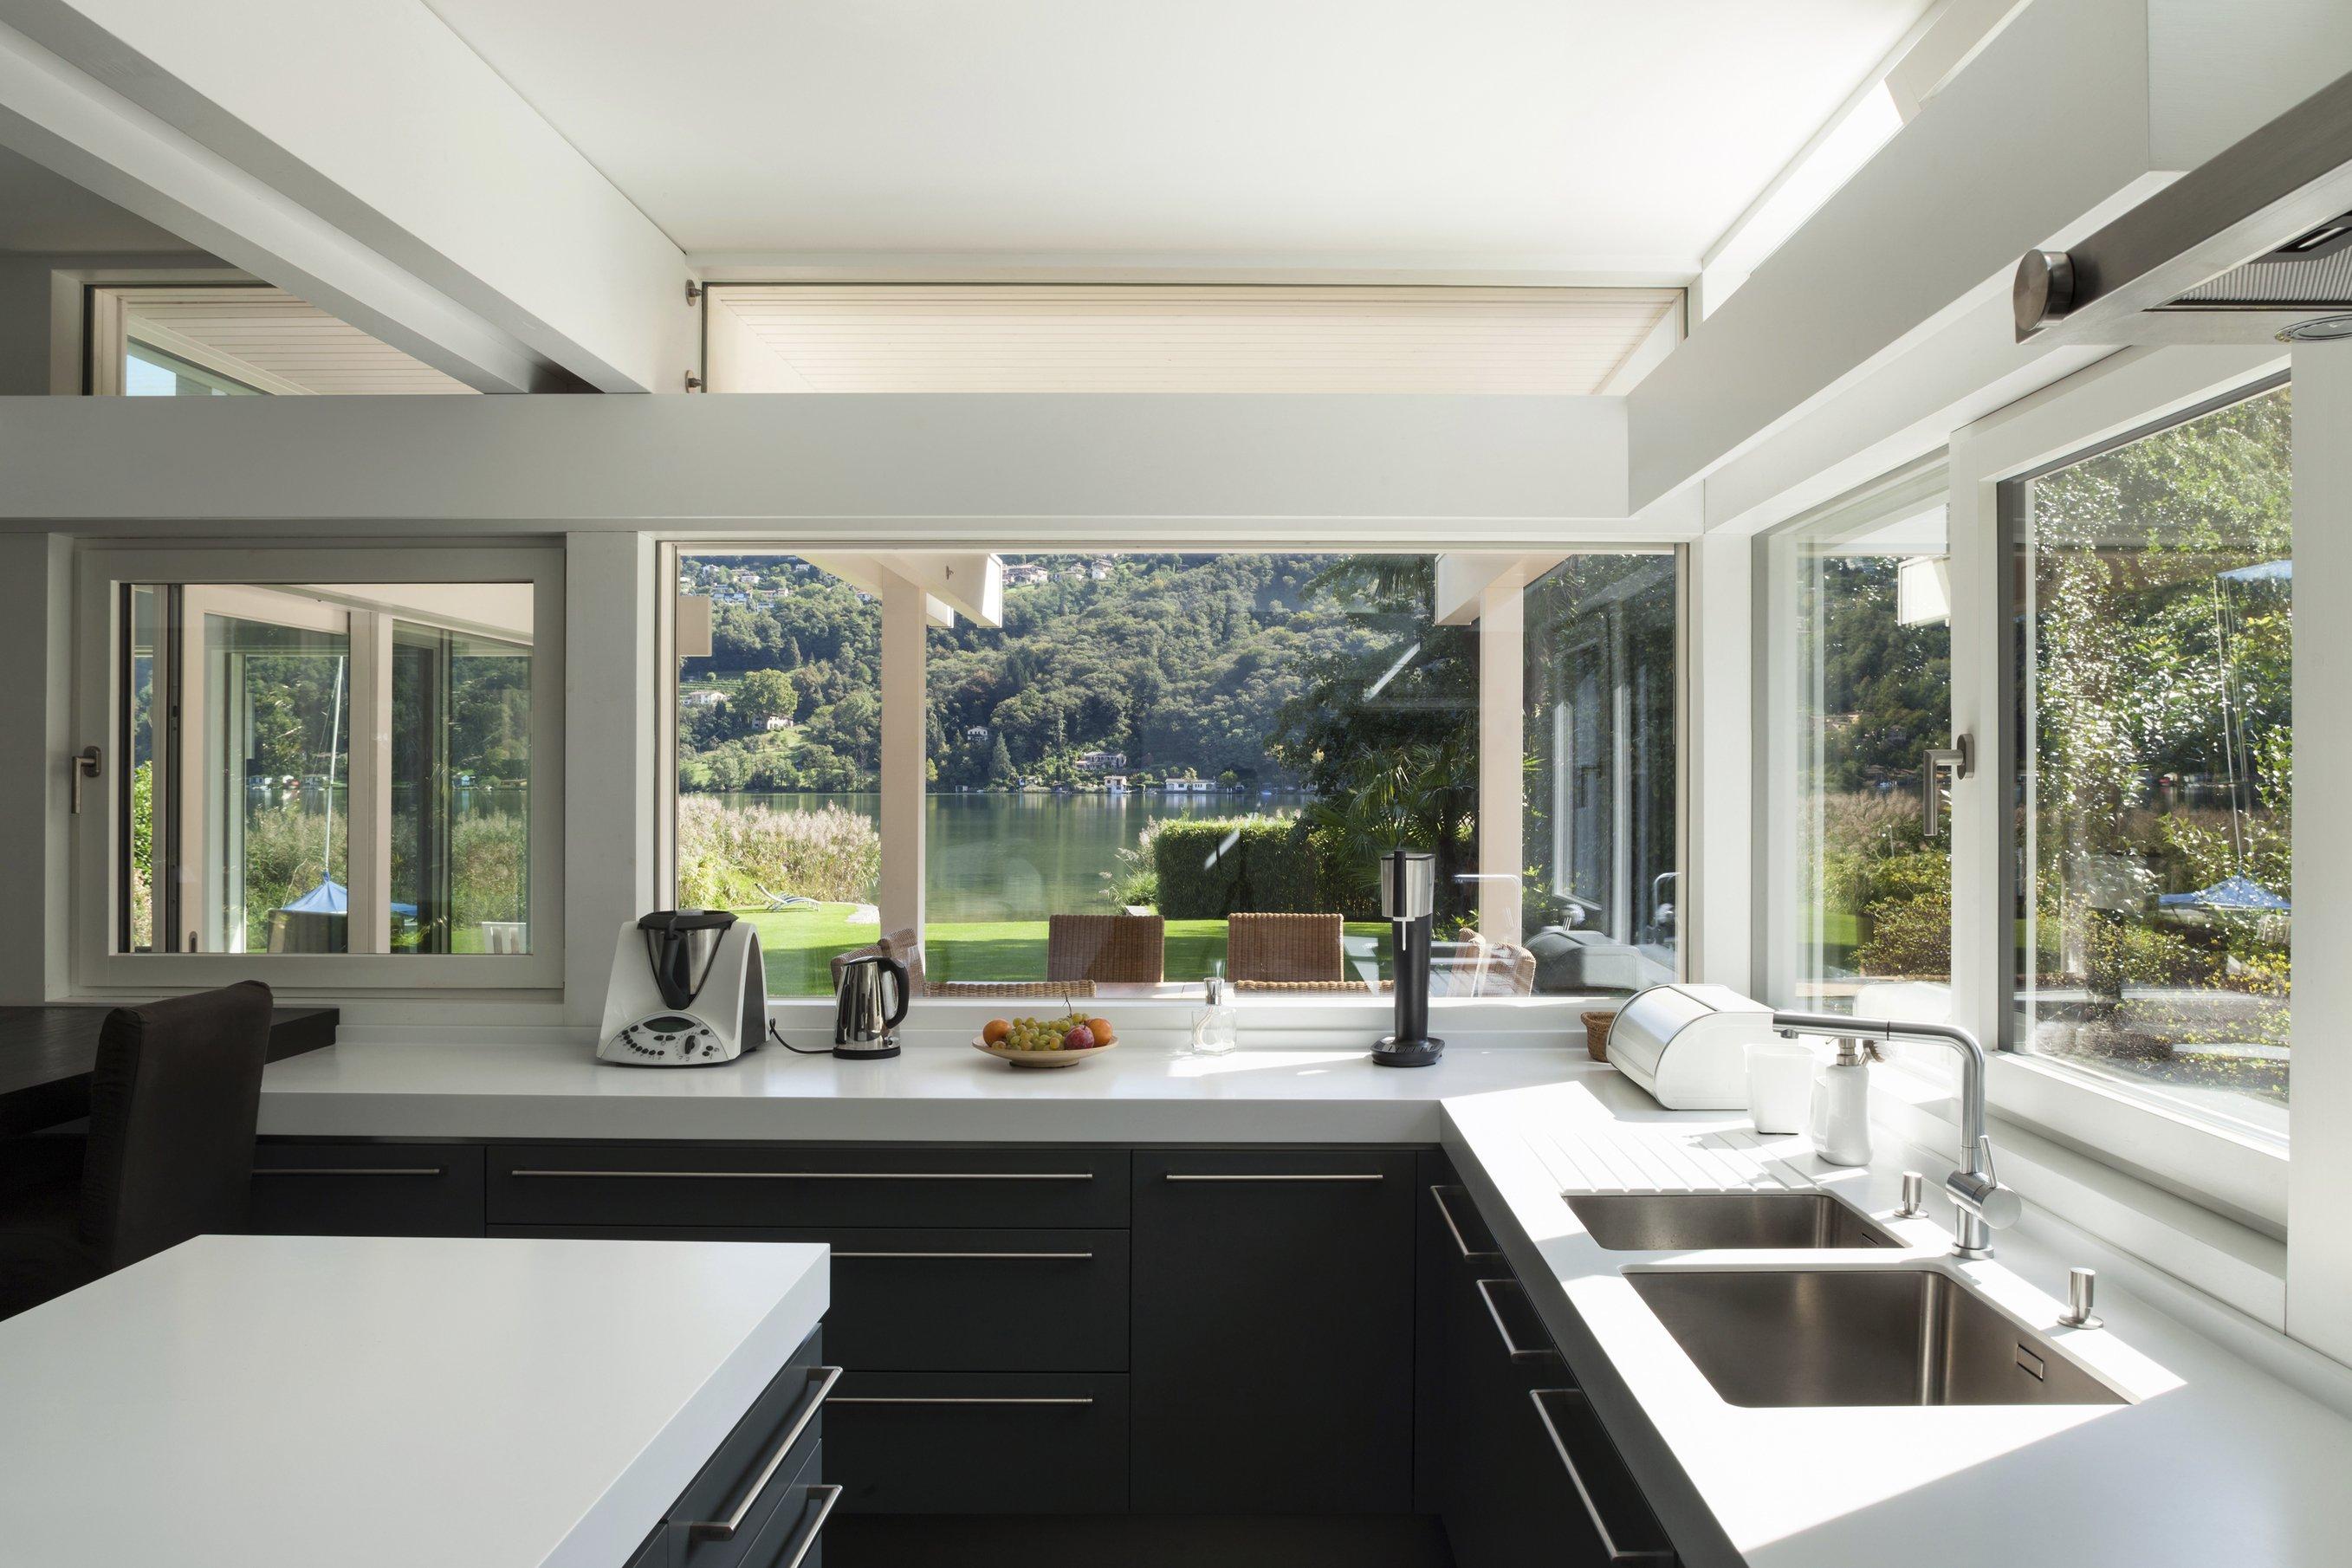 uto & esidential Window Glass Durham, N Insulated & Laminated ... - ^